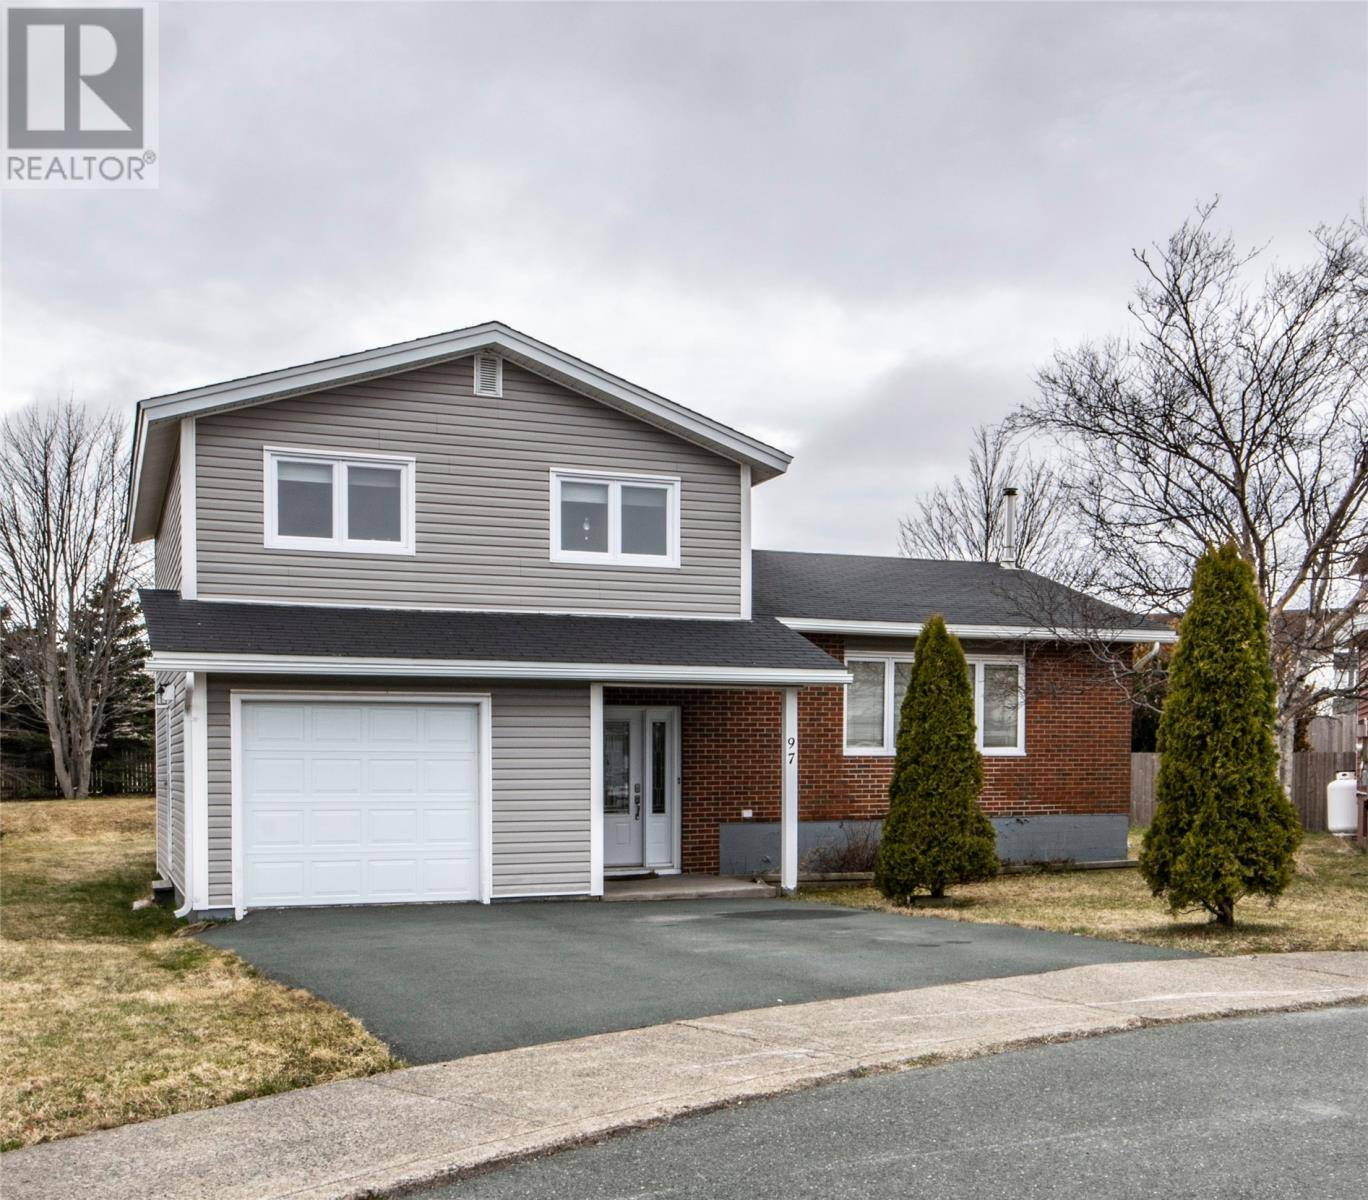 House for sale at 97 Virginia Pl St. John's Newfoundland - MLS: 1200712